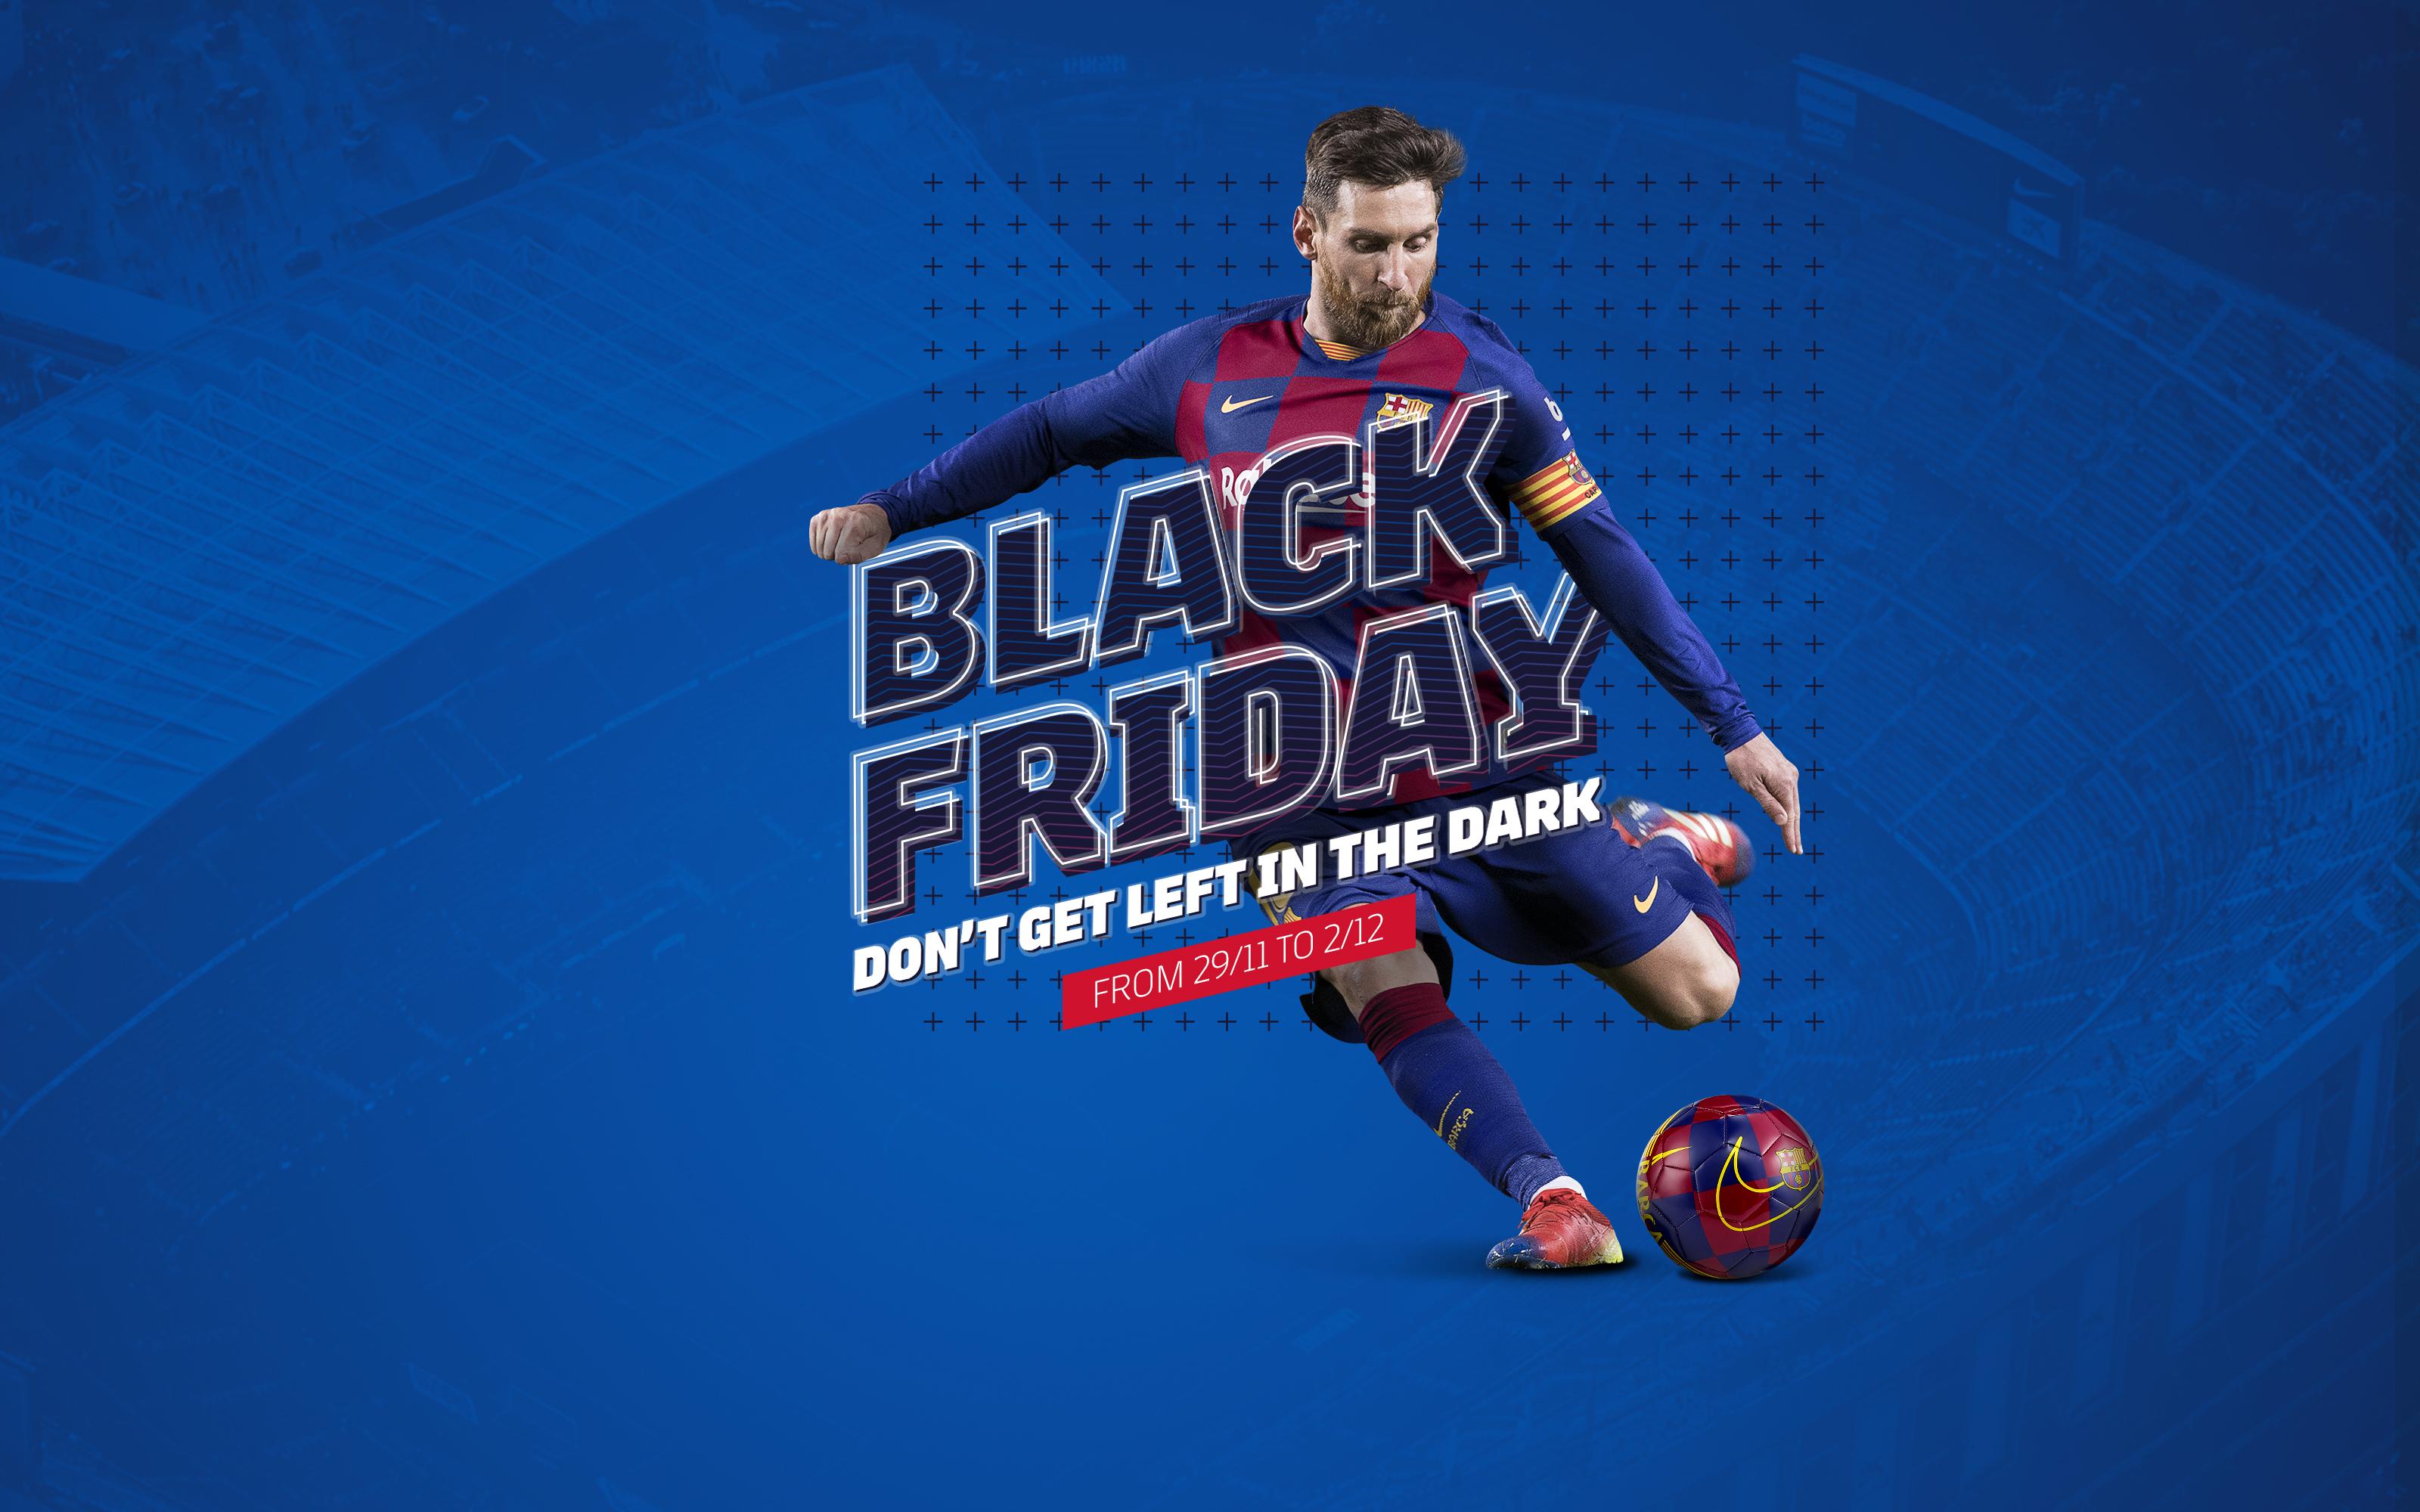 Barça S Black Friday From November 29 To December 2